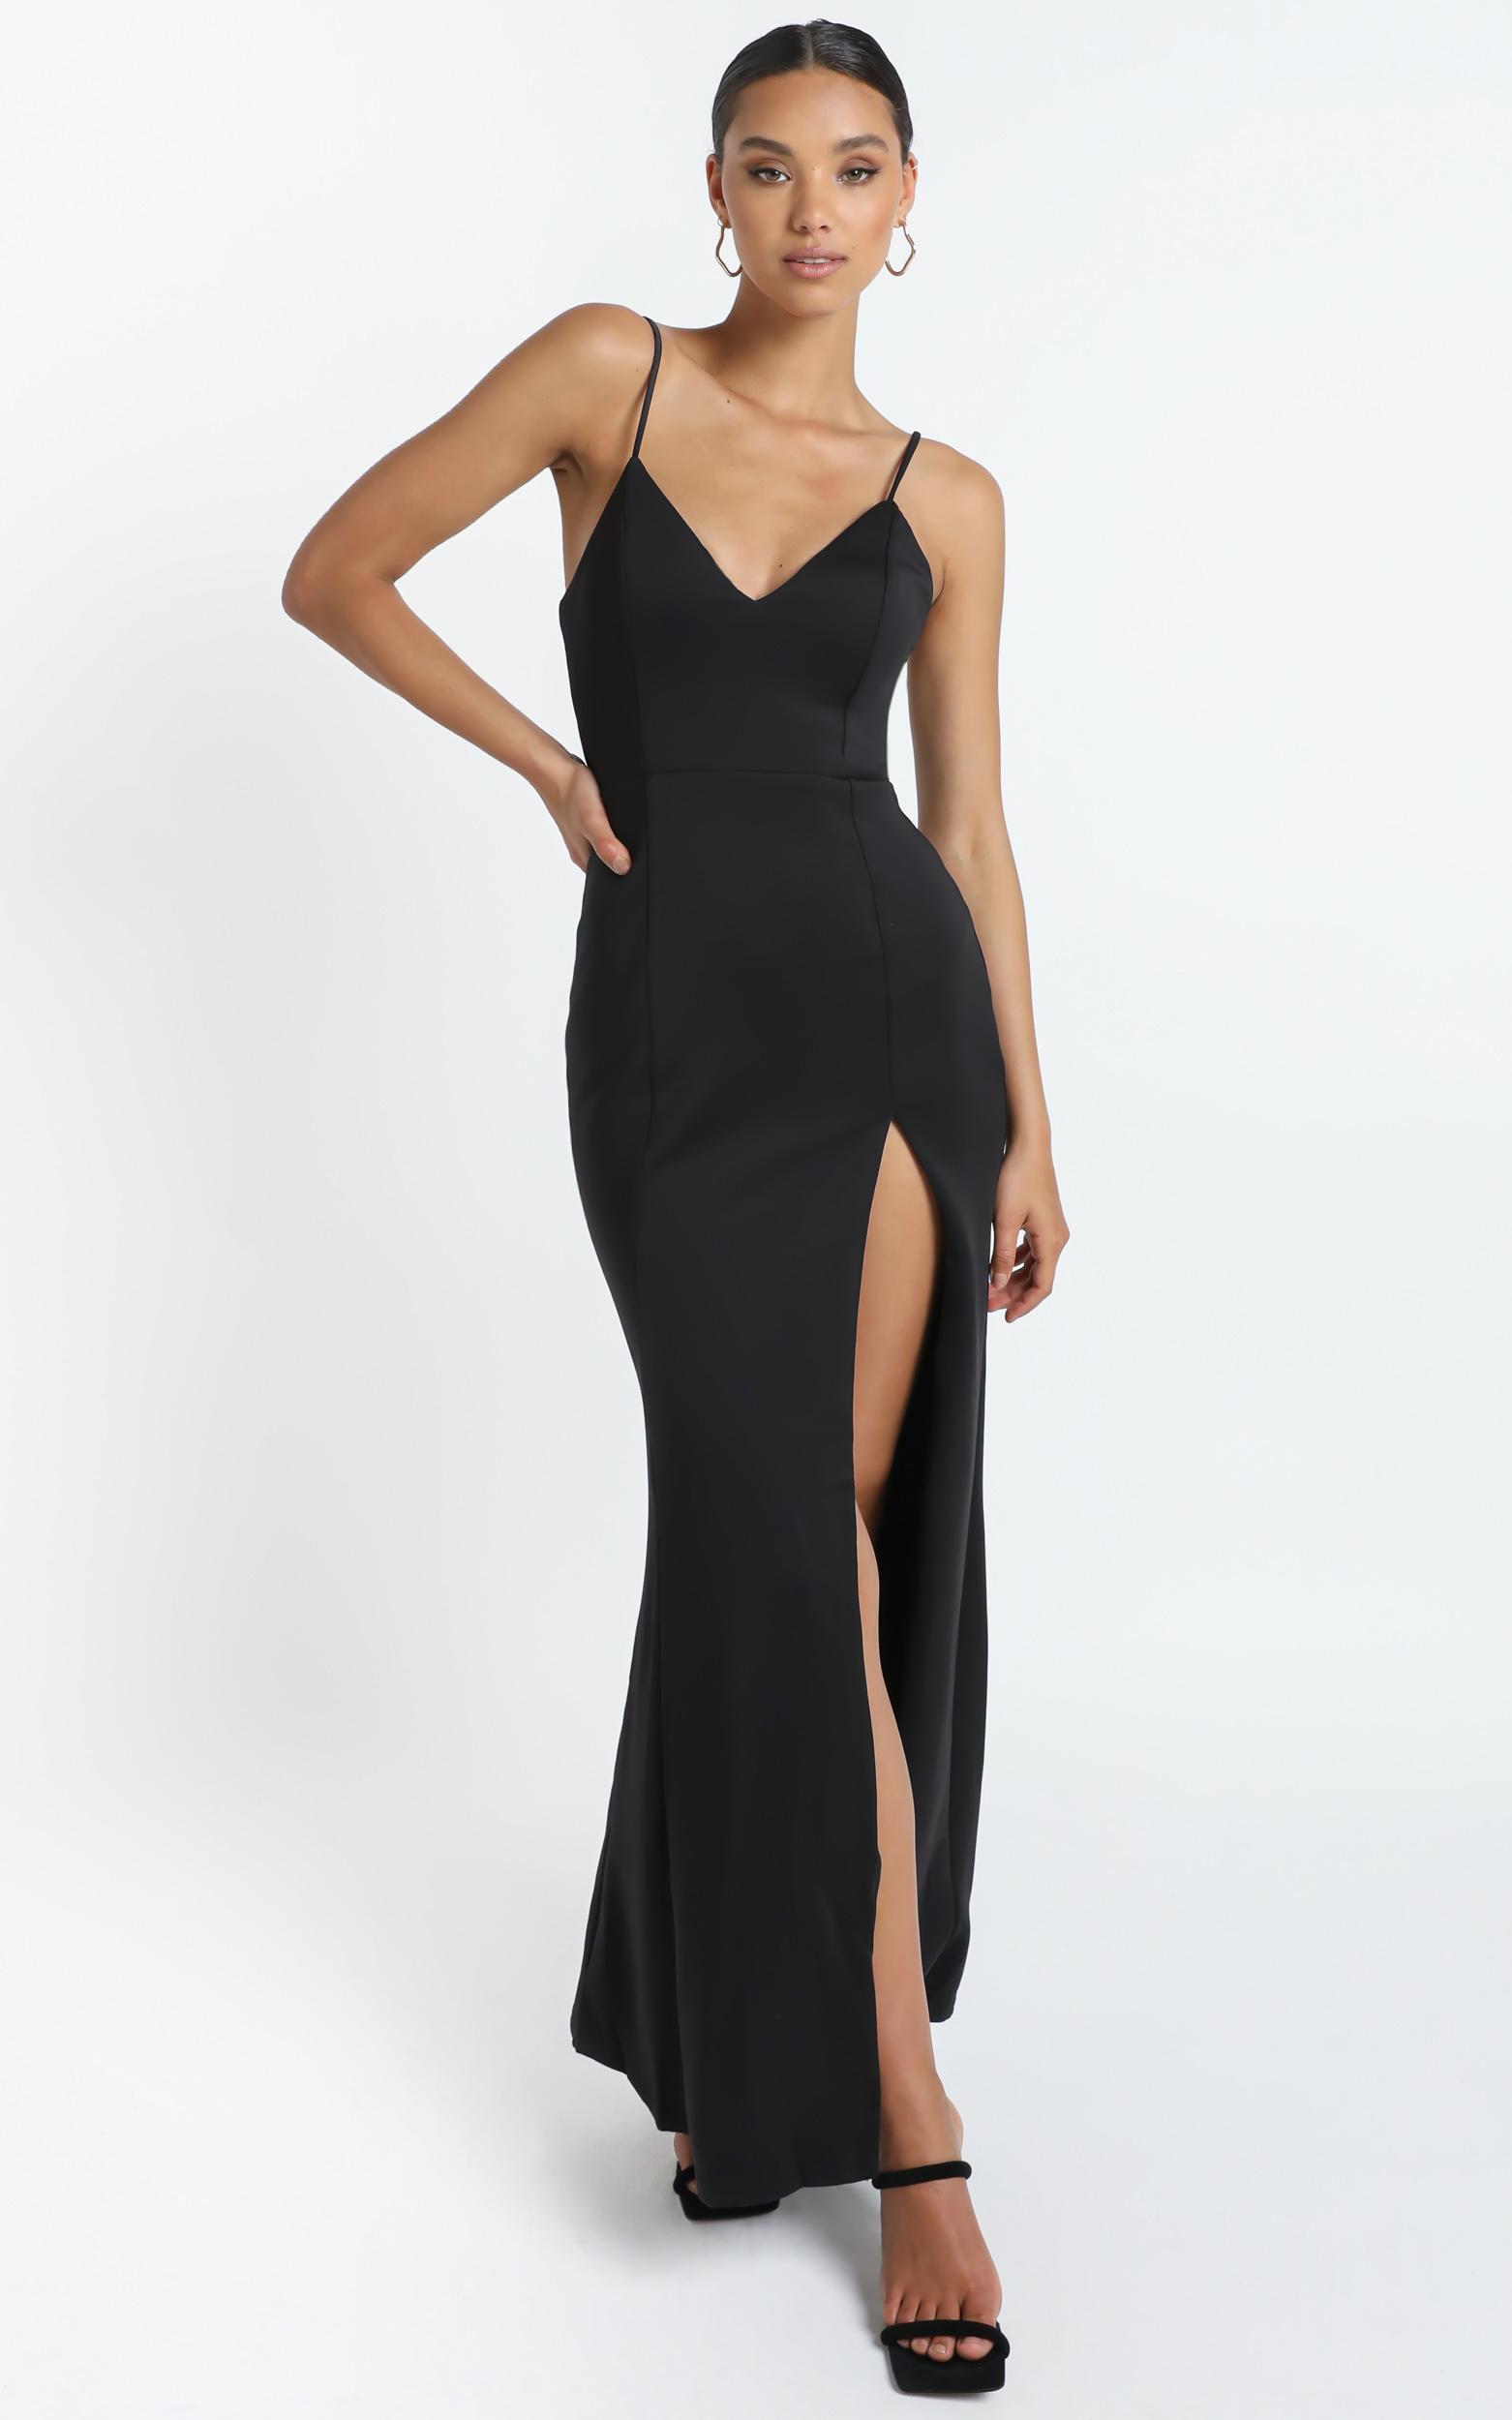 Dare To Dream Maxi Dress in black - 20 (XXXXL), Black, hi-res image number null